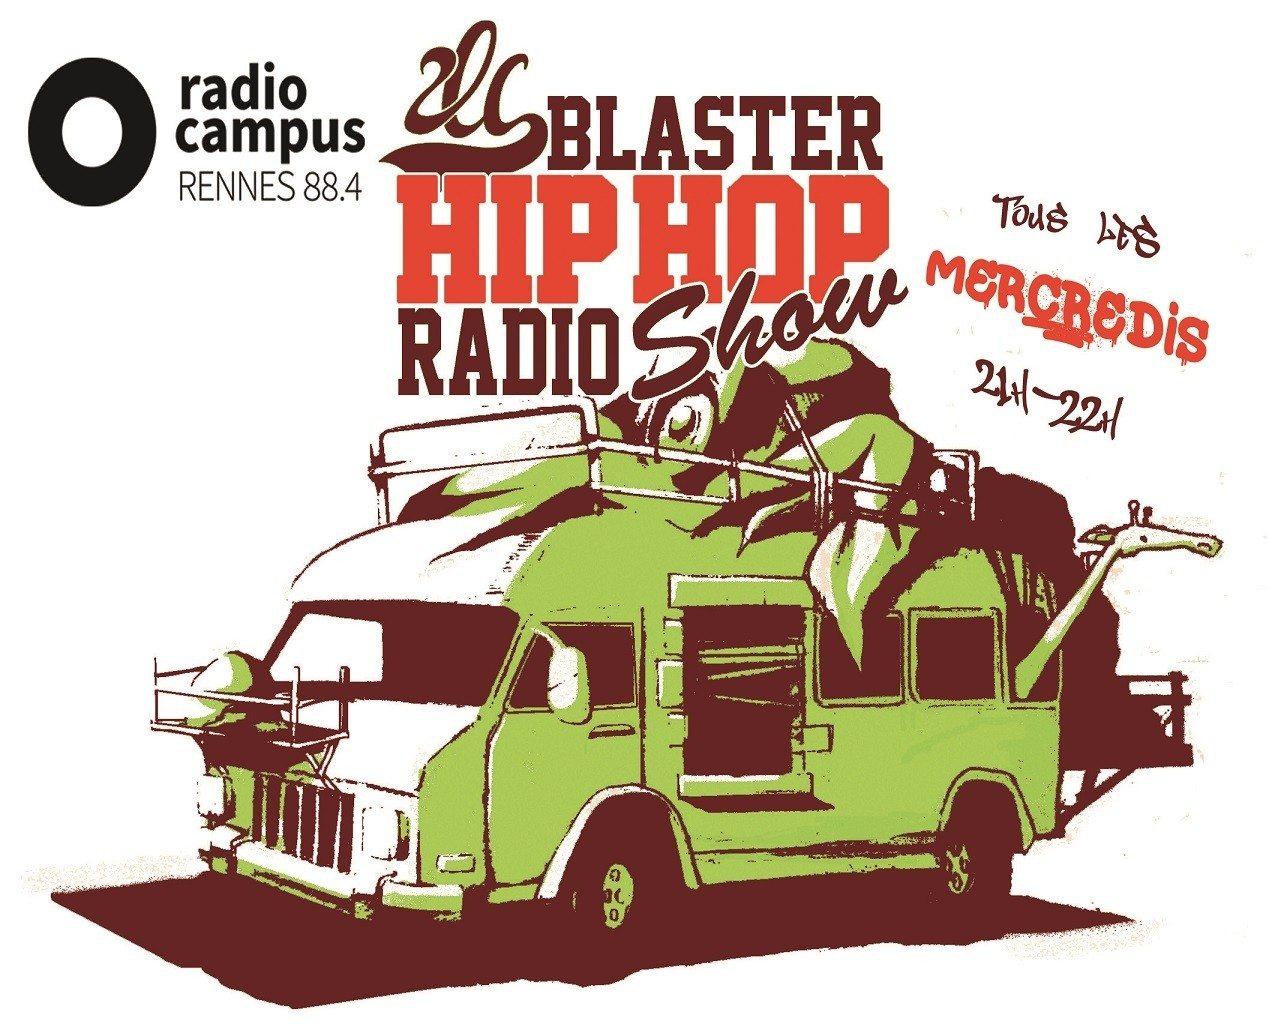 2LC Blaster Hip-Hop Live radio show Rennes